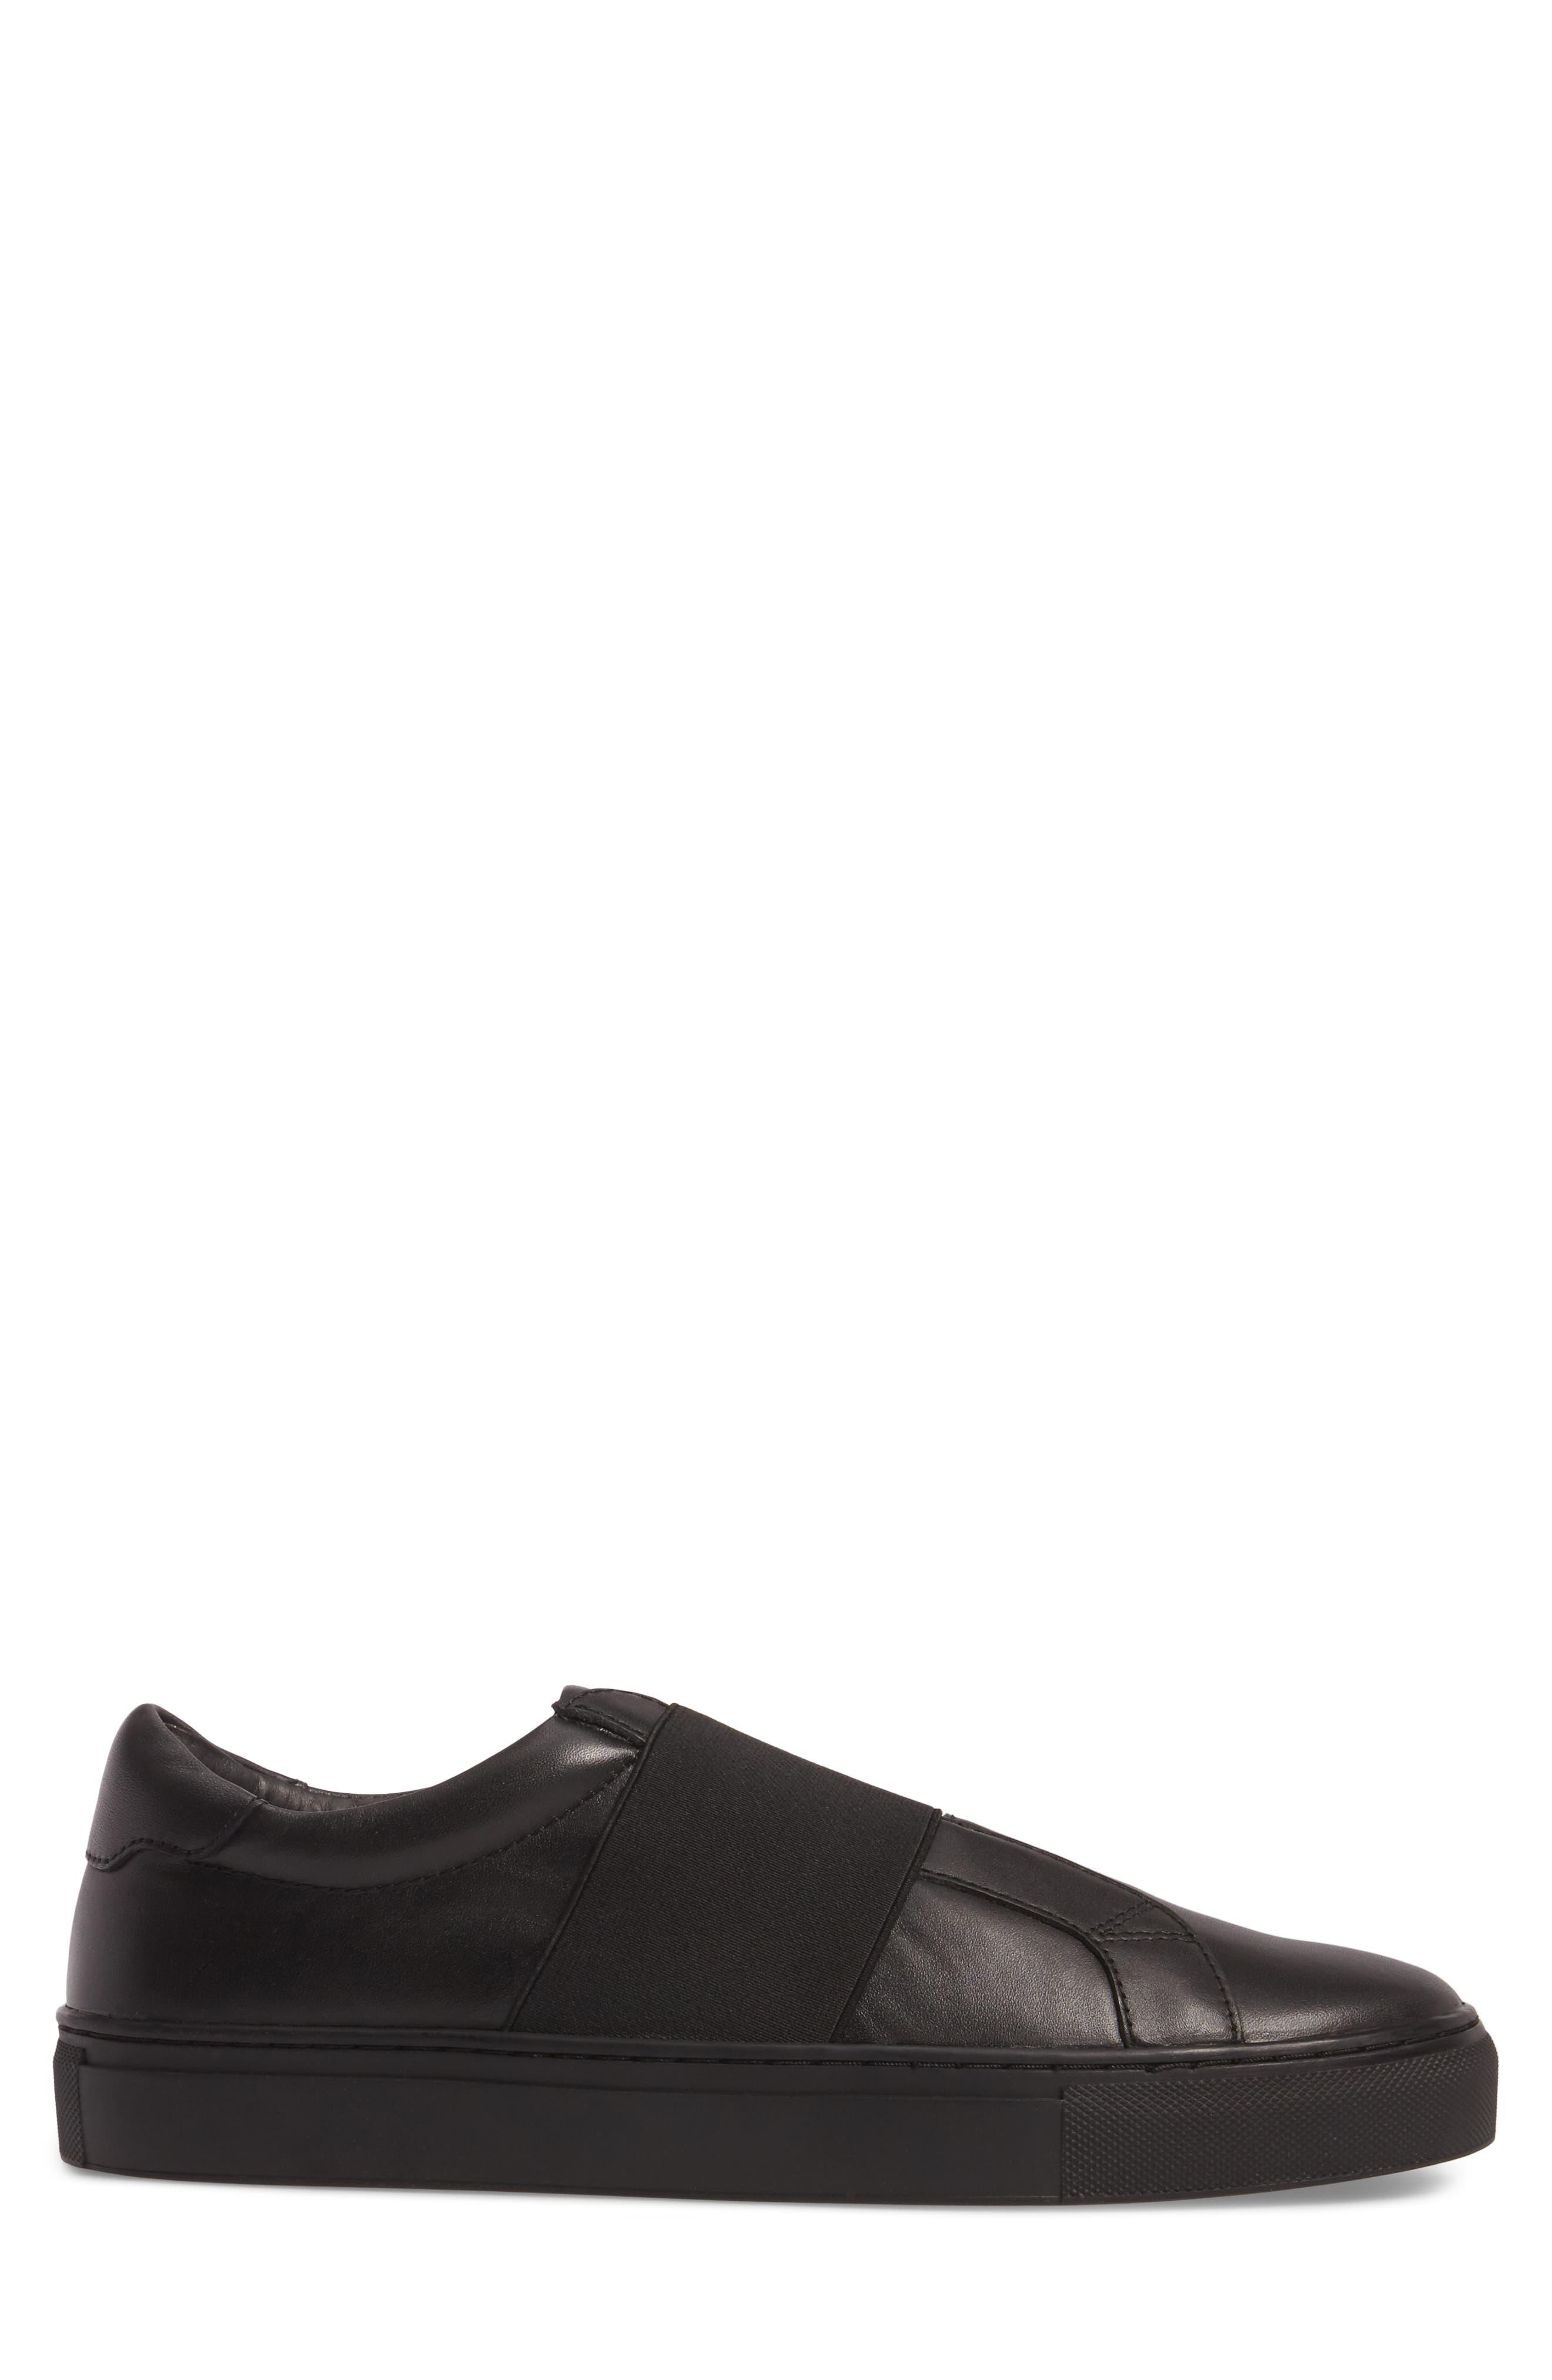 Darel Slip-On,                             Alternate thumbnail 3, color,                             Black Leather